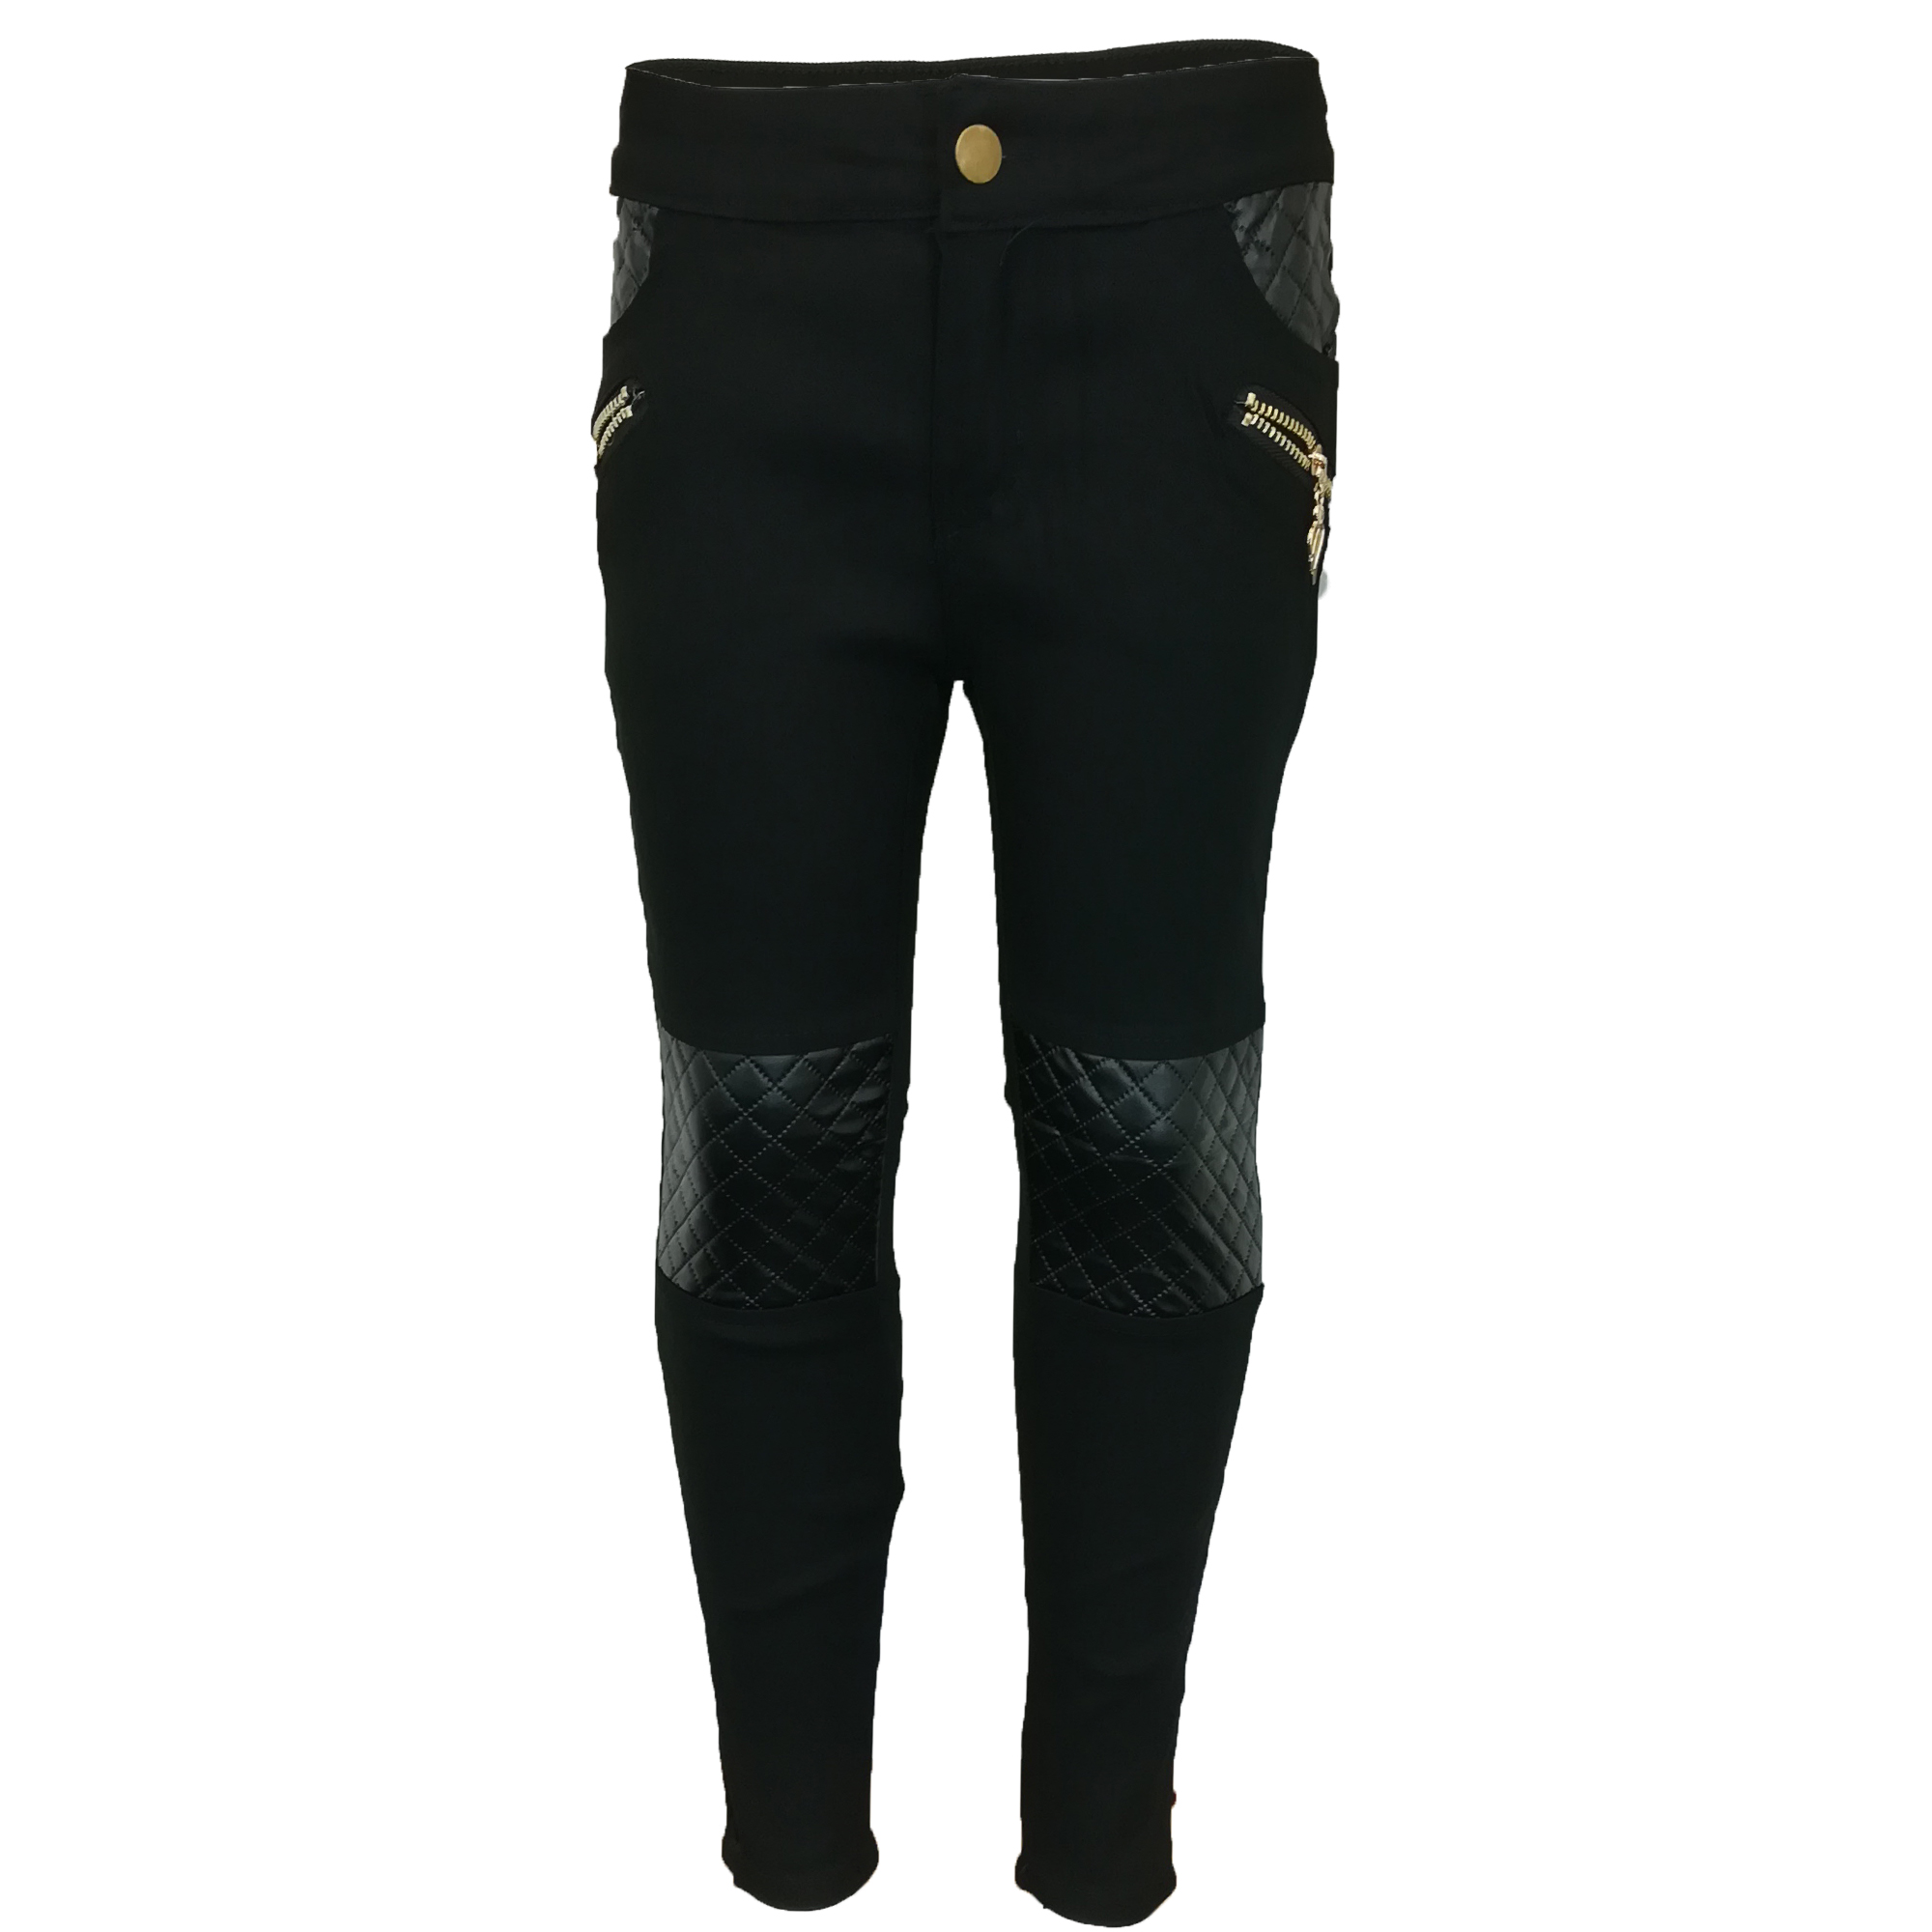 Girls-Denim-Jeans-Kids-Pants-Trousers-Bottoms-Children-Fashion-Casual-Summer-New